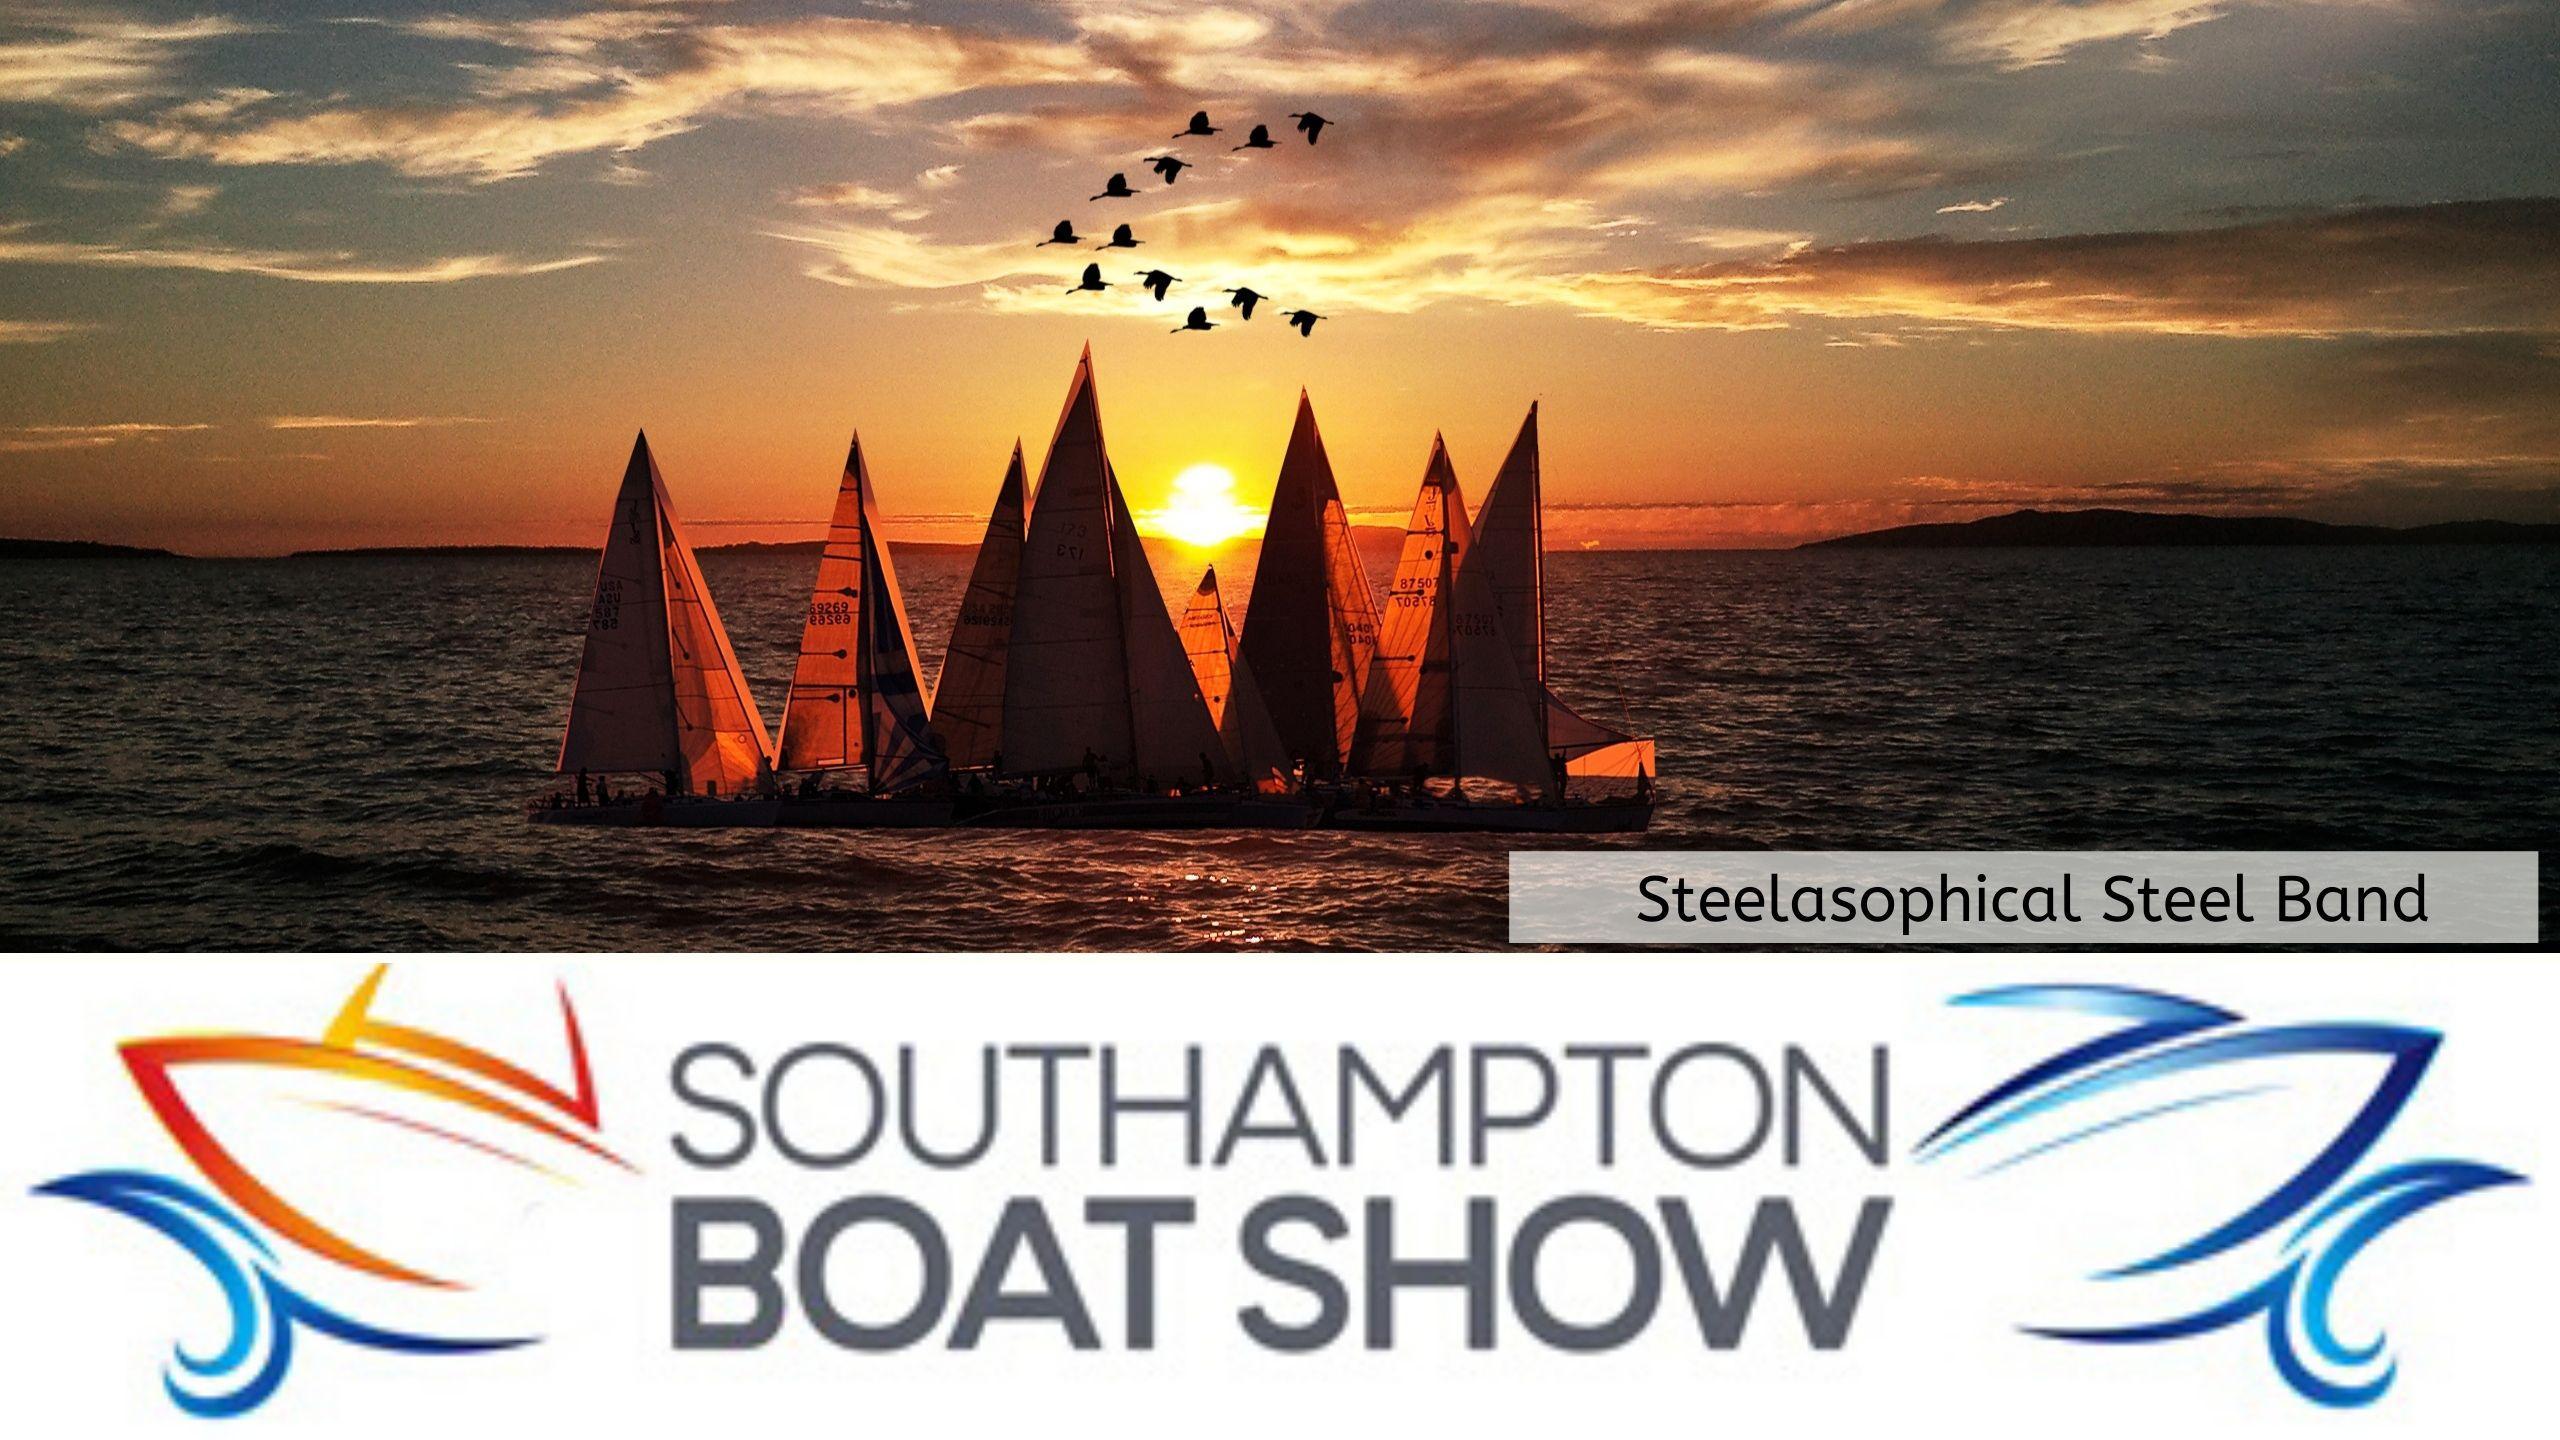 Steelasophical Steel Band Southampton Boat Show Yacht Market Sailing Sea